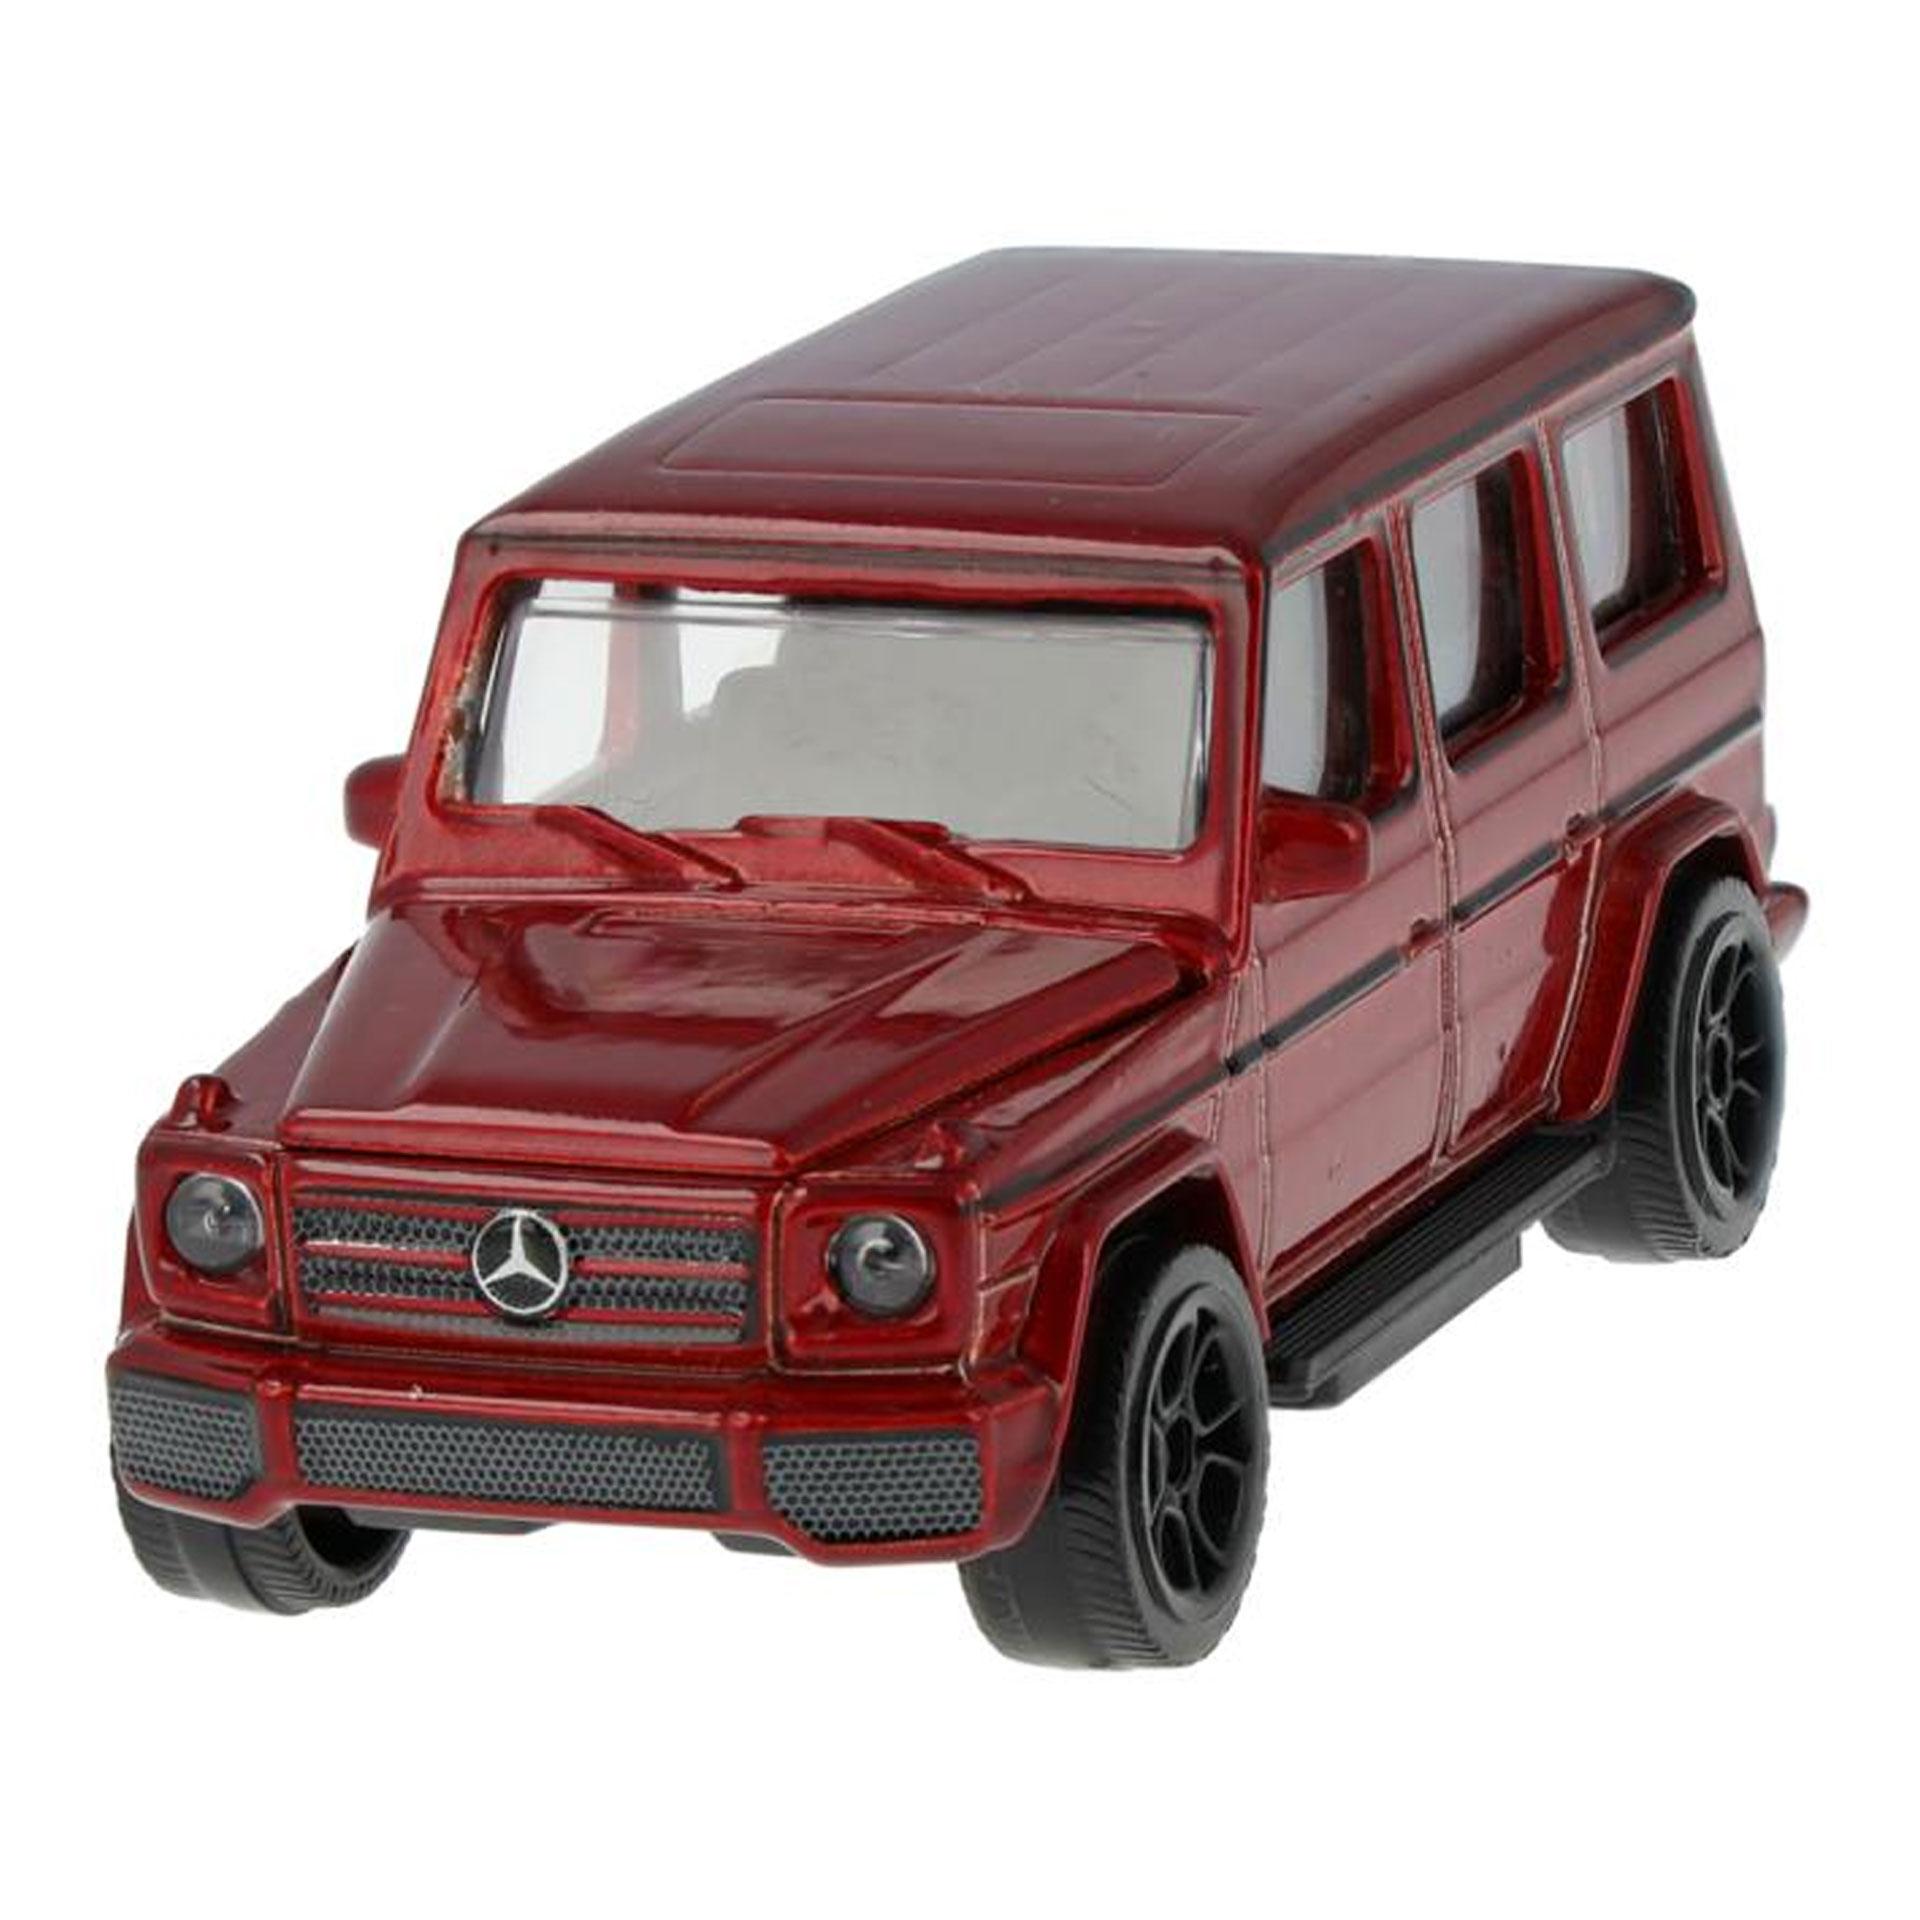 Mercedes-Benz Modellauto G-Klasse W463 3 Zoll rot